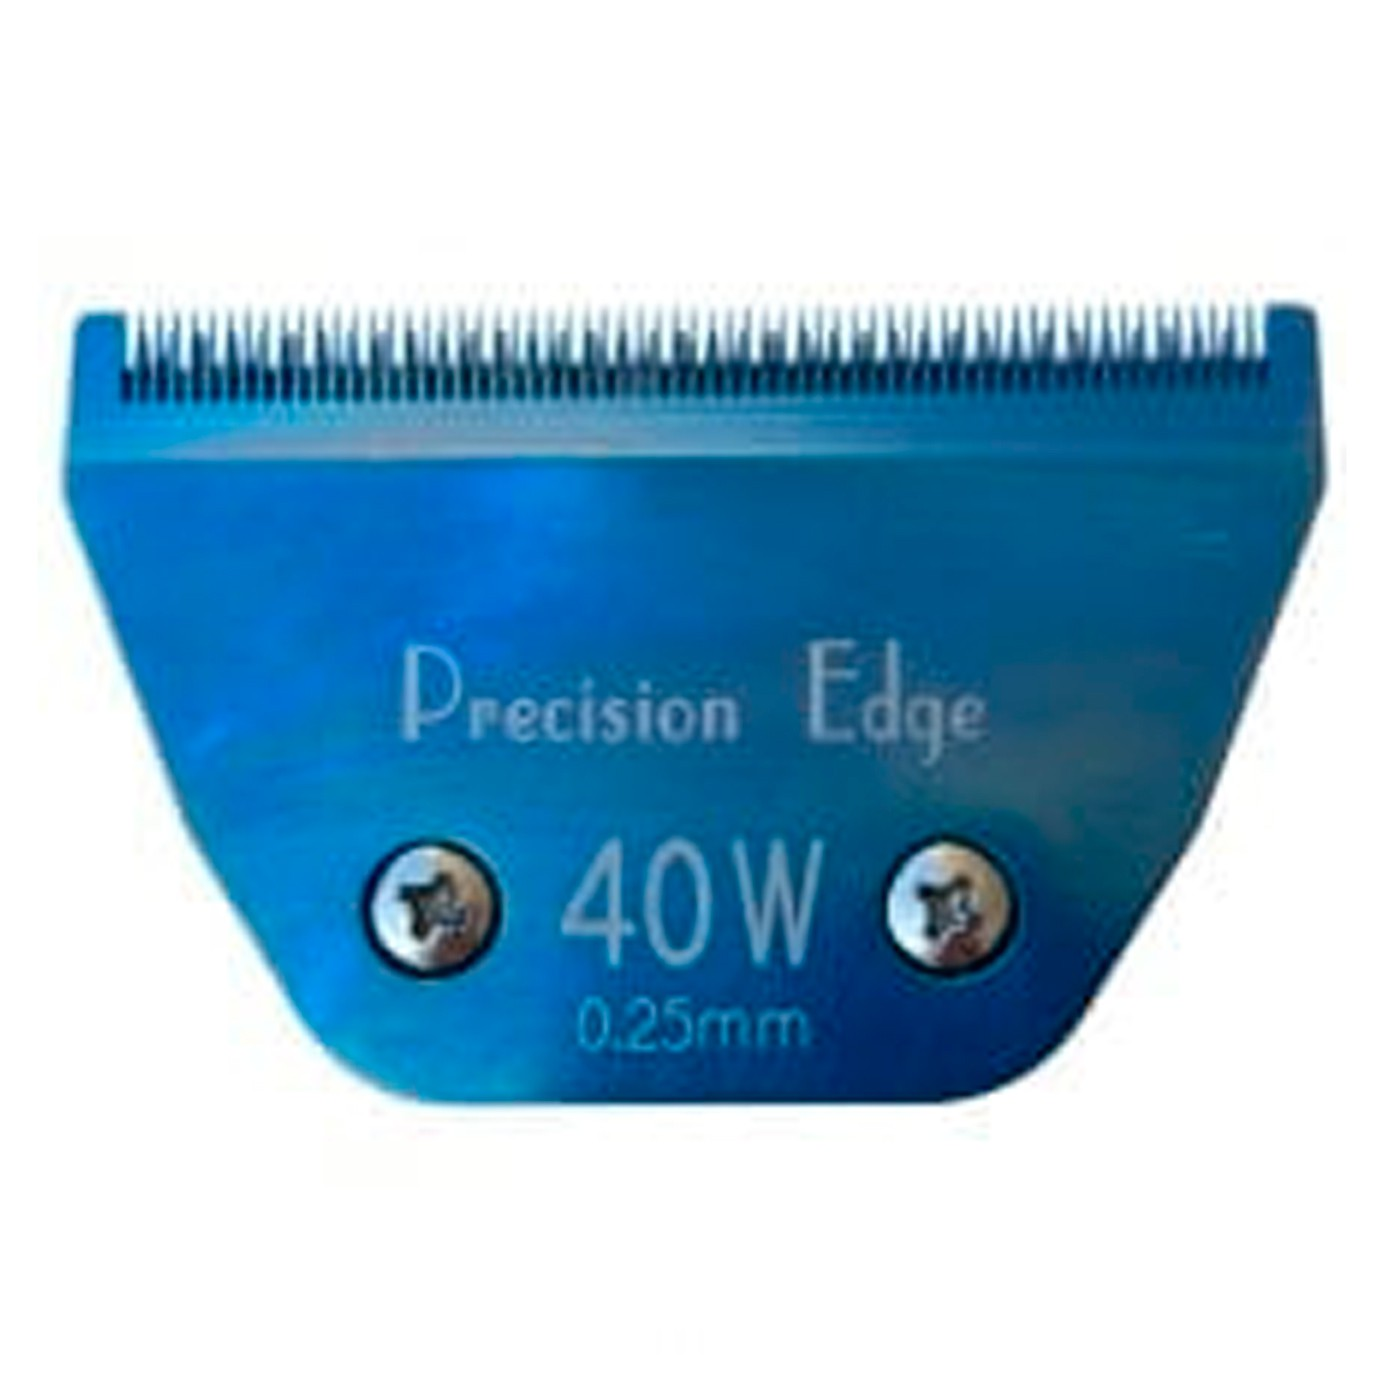 Lâmina Precision Edge 40 Wide Blue - 0,25mm